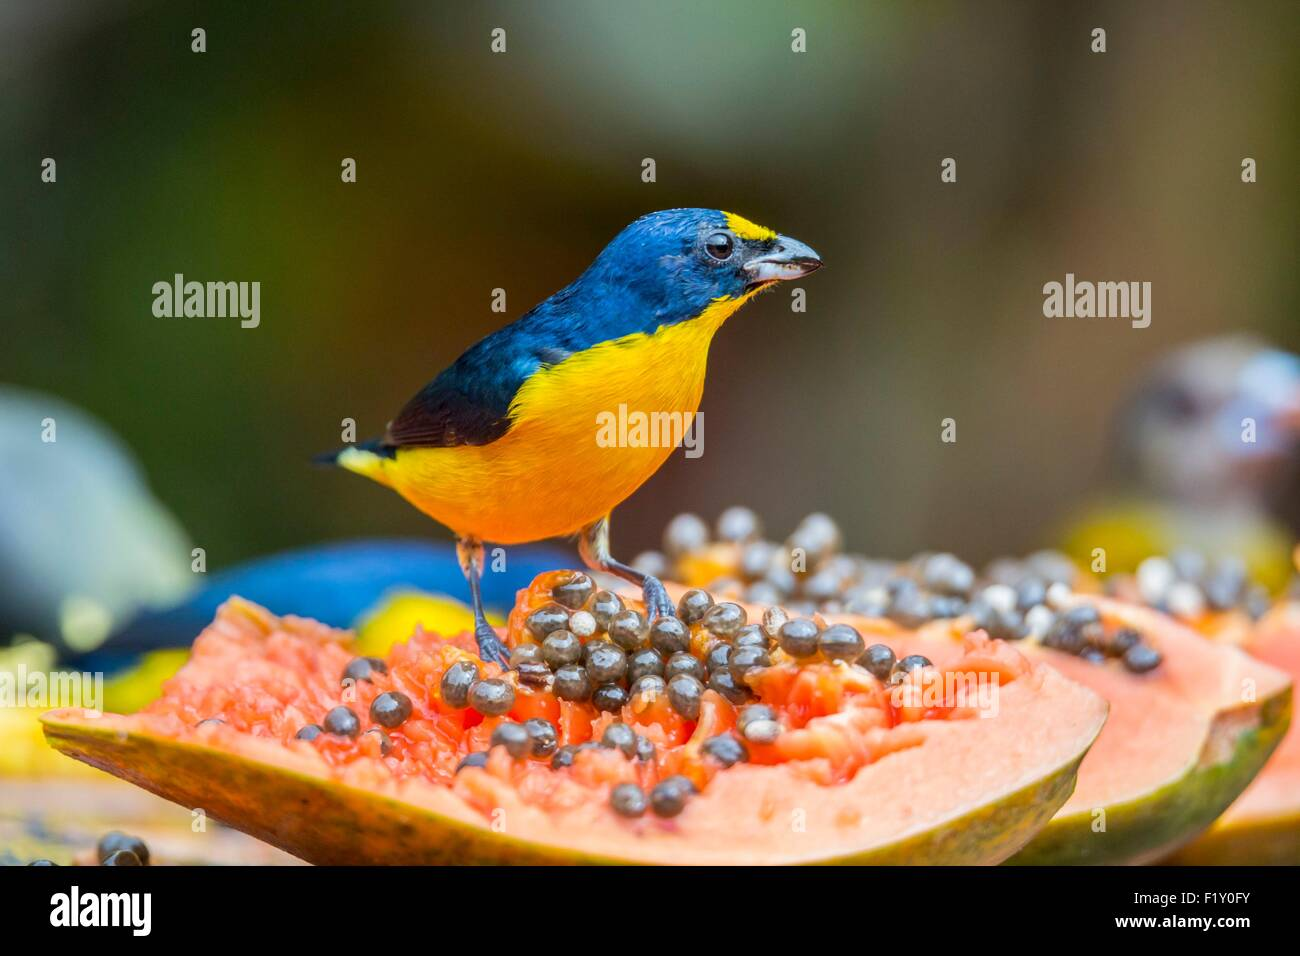 Costa Rica, Alajuela province, Arenal, tropical bird - Stock Image